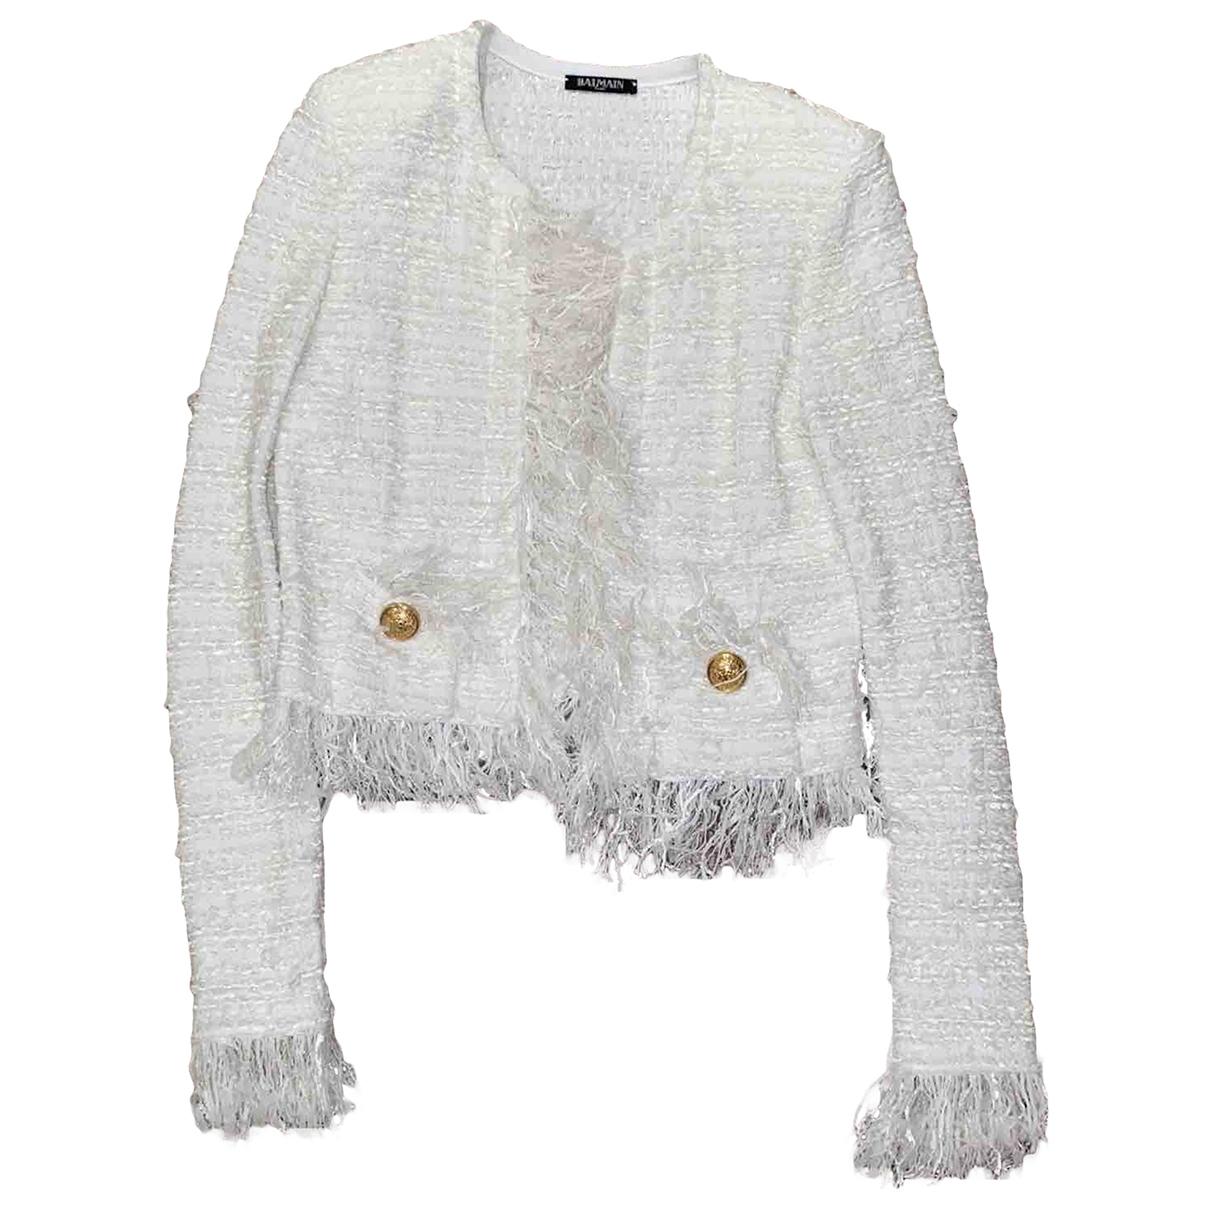 Balmain \N White Cotton jacket for Women 38 FR